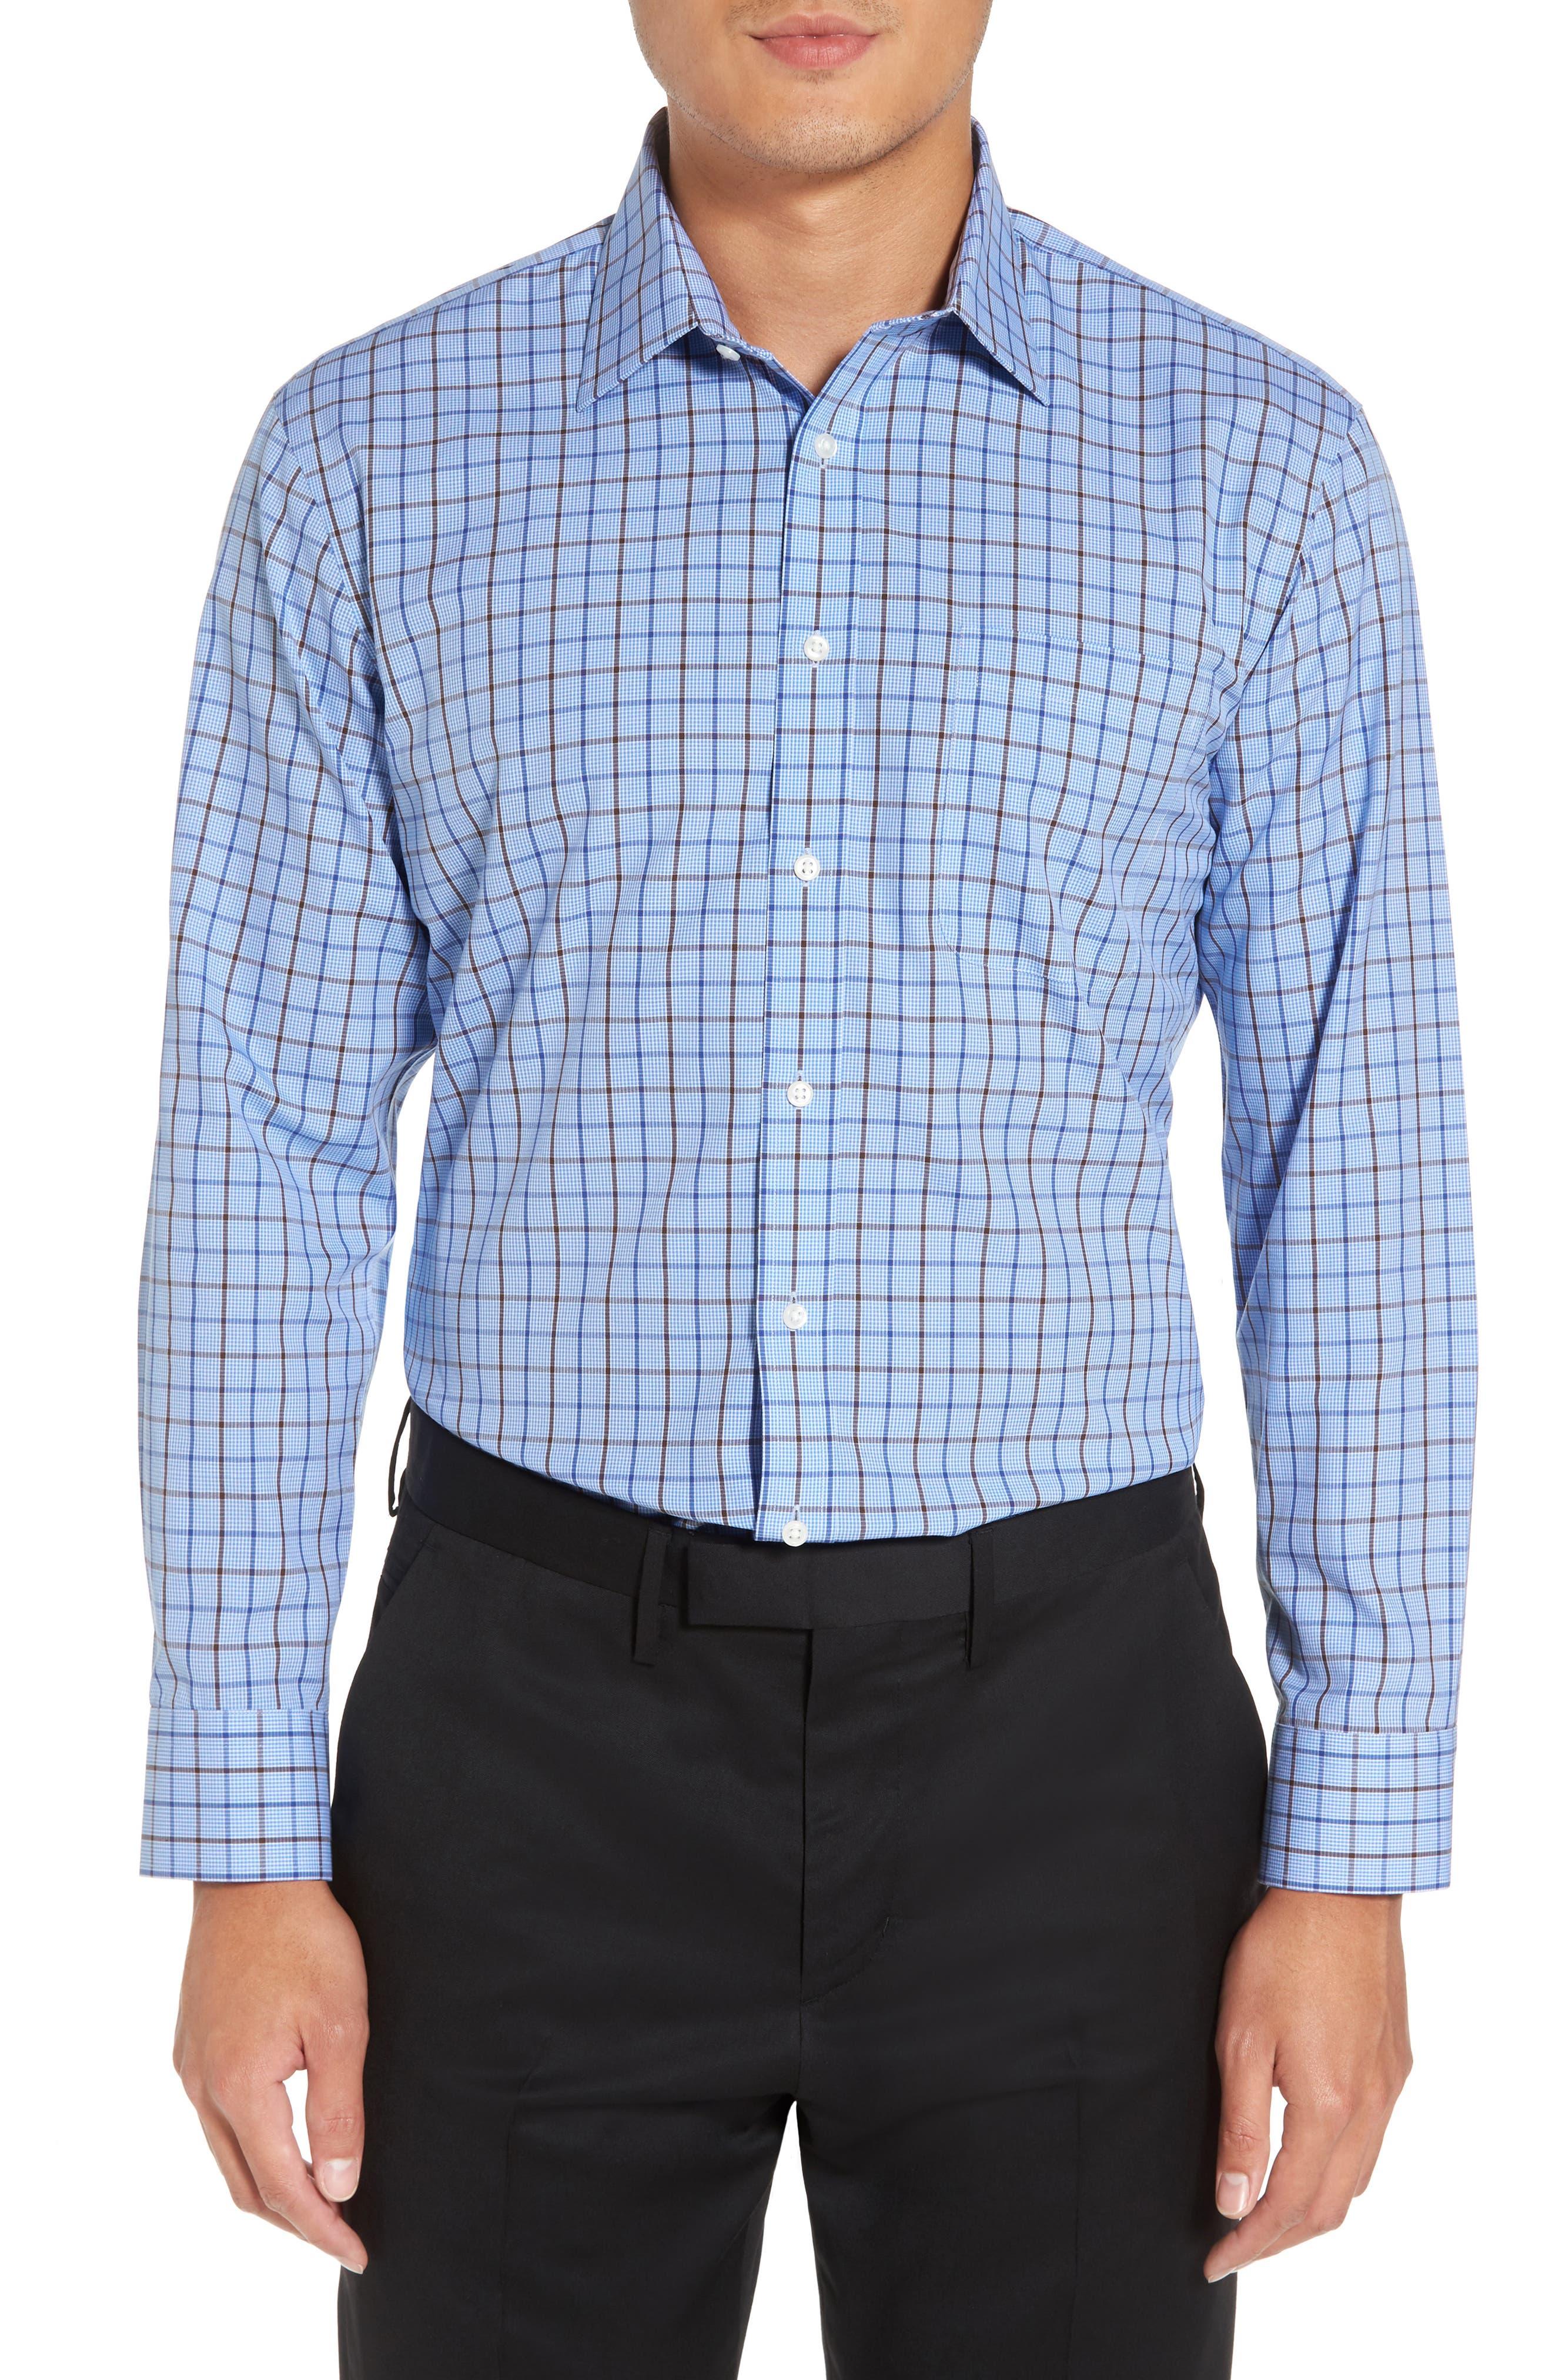 Alternate Image 2  - Nordstrom Men's Shop Smartcare™ Trim Fit Check Dress Shirt